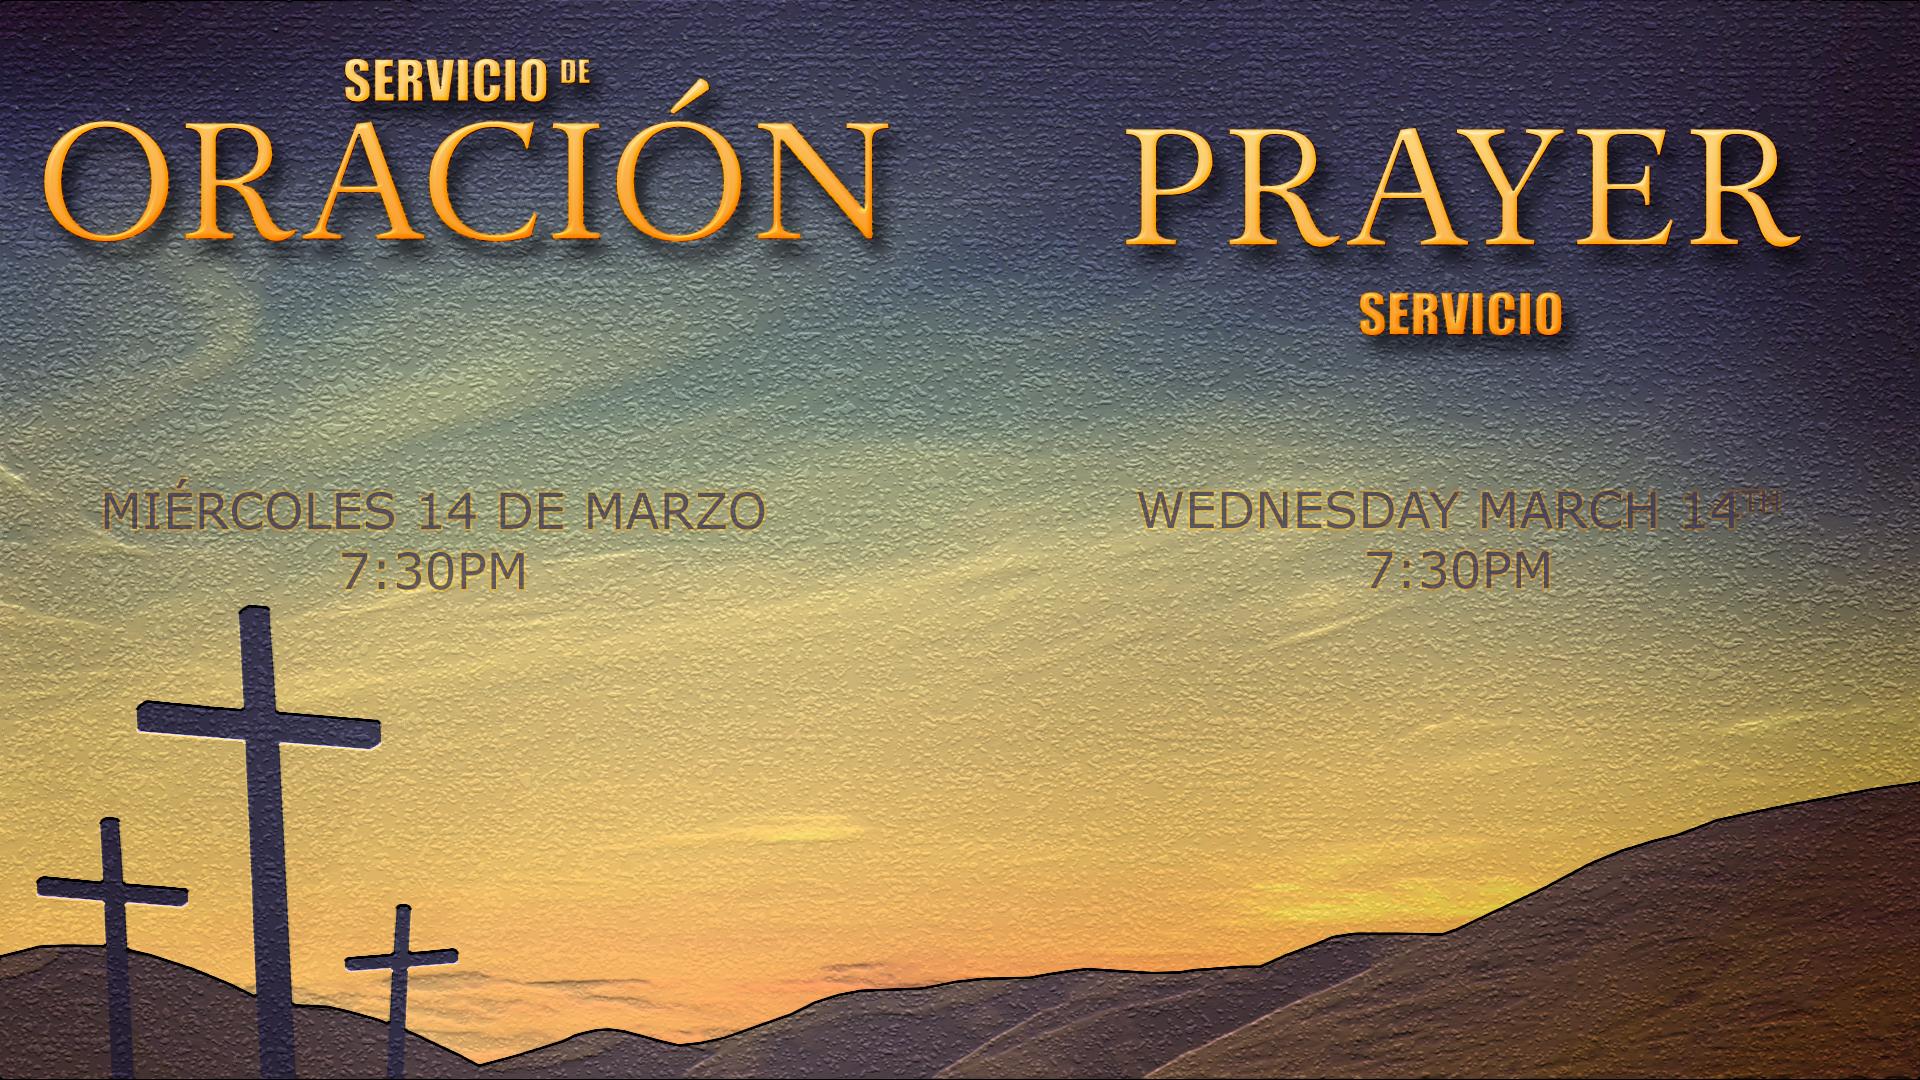 Prayer Service Wednesday March 14th